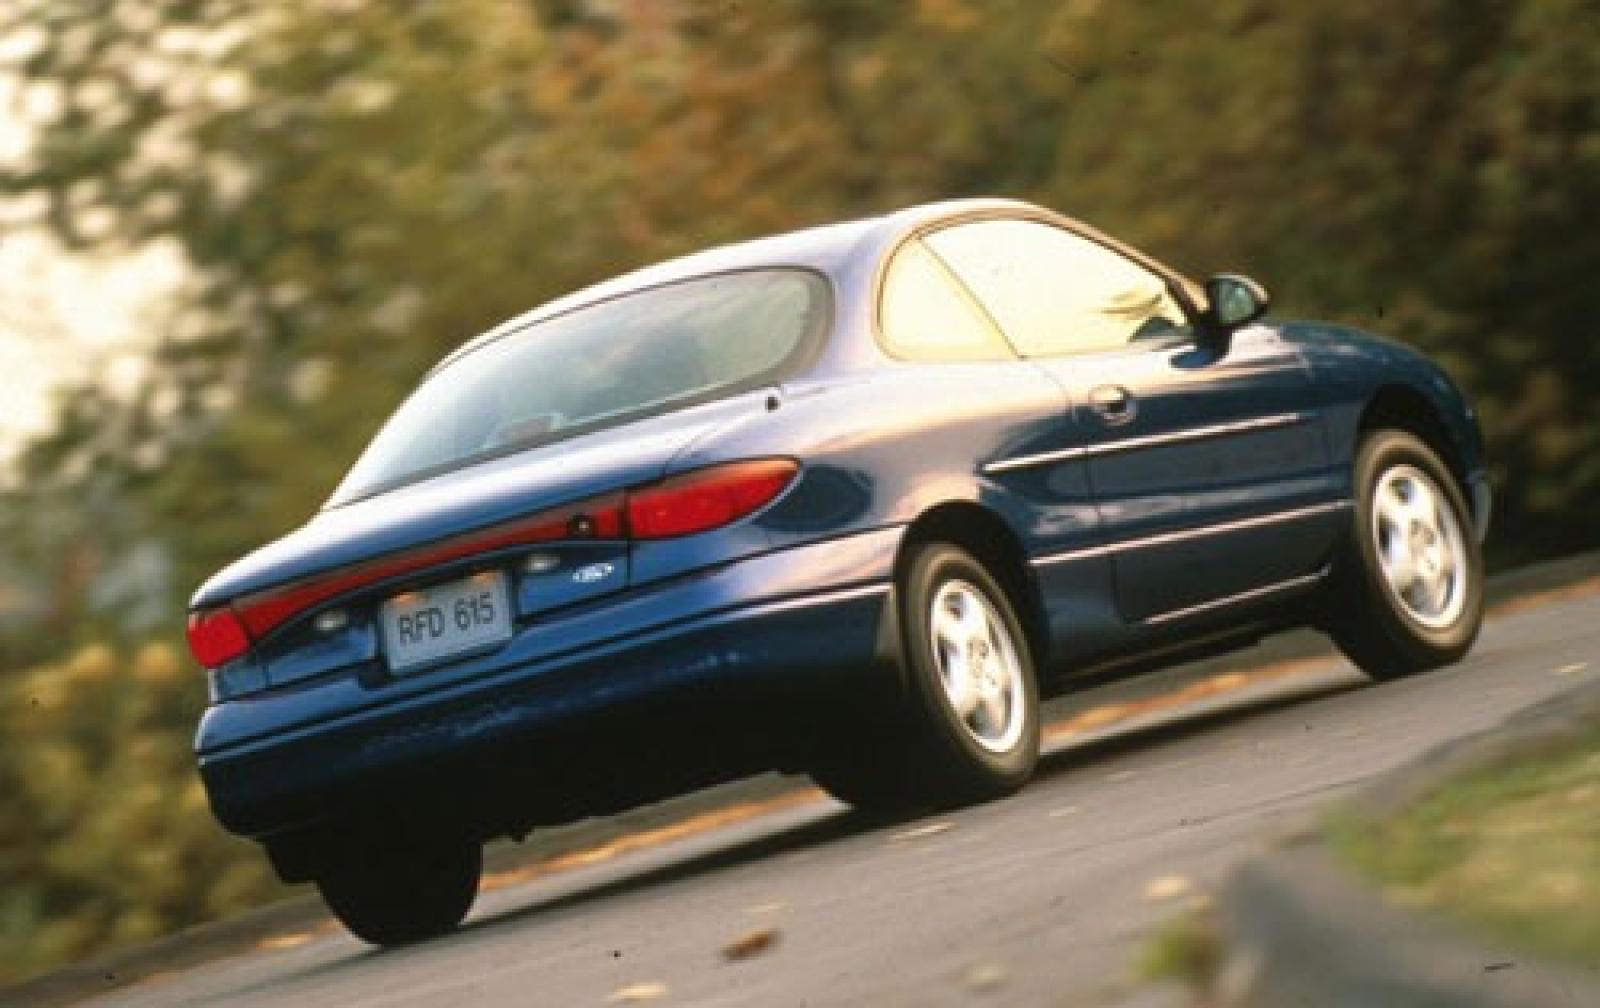 800 1024 1280 1600 Origin 2001 Ford